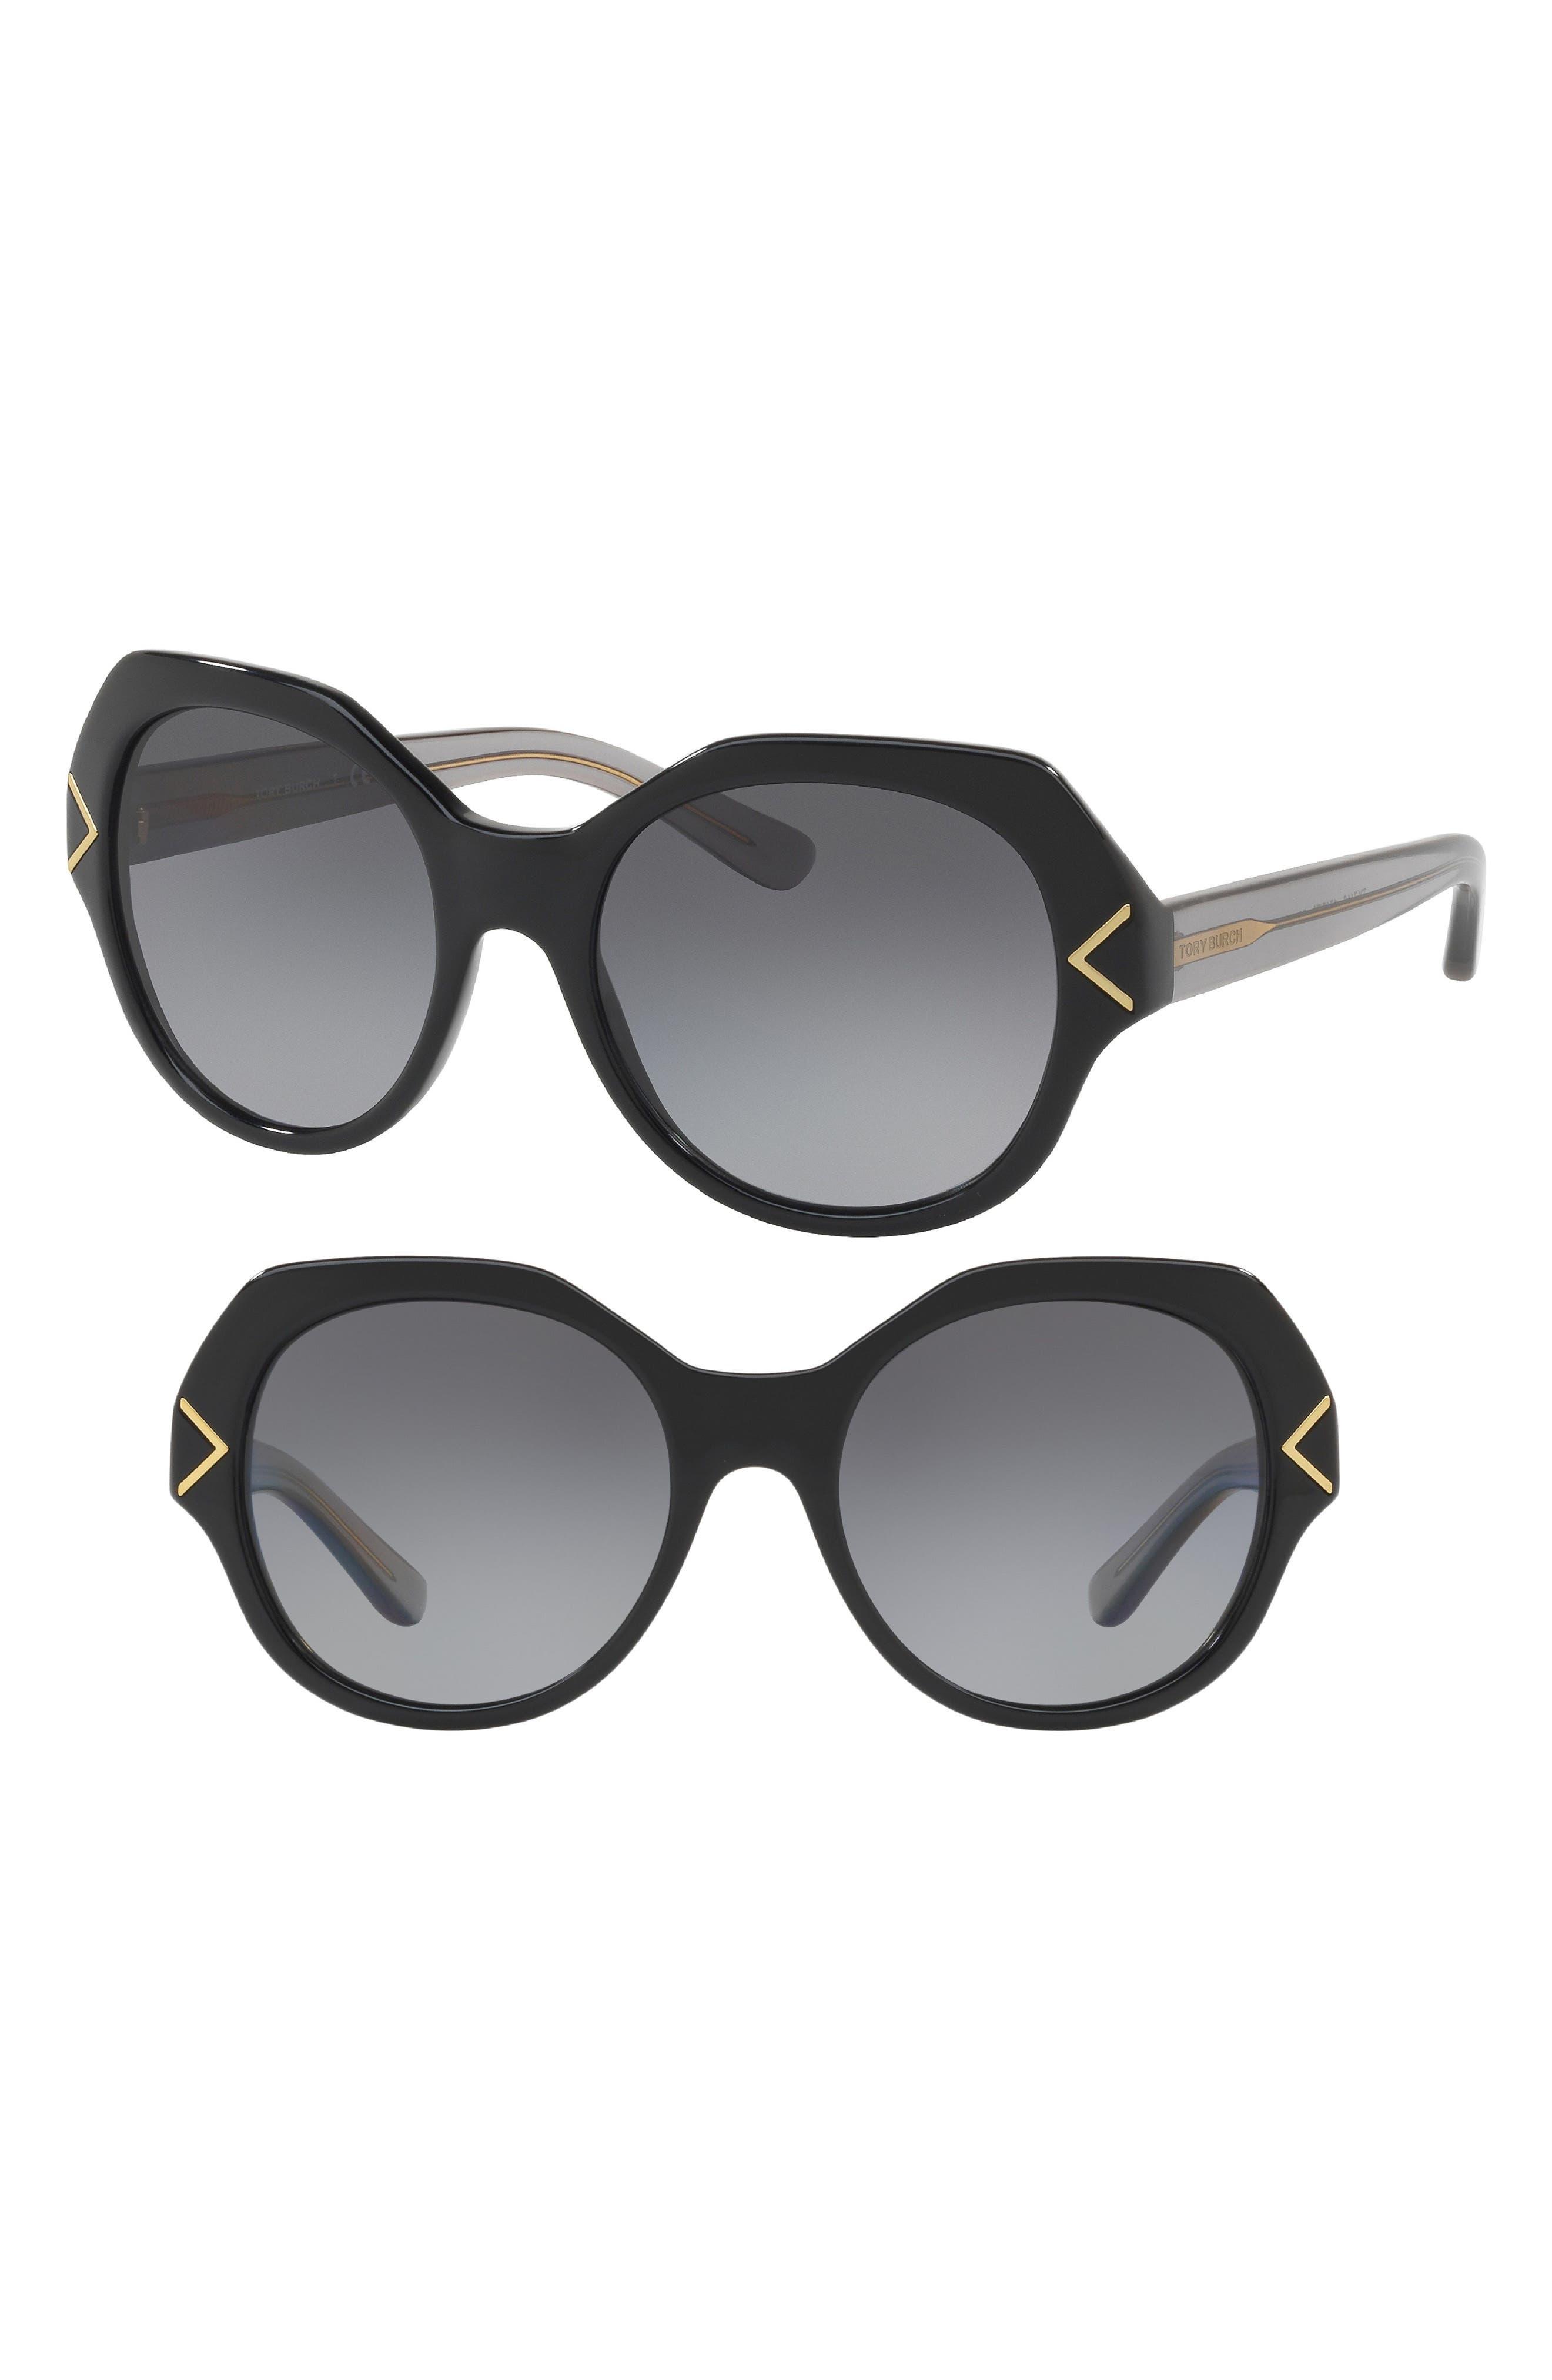 53mm Polarized Gradient Geometric Sunglasses,                             Main thumbnail 1, color,                             Black/ Silver